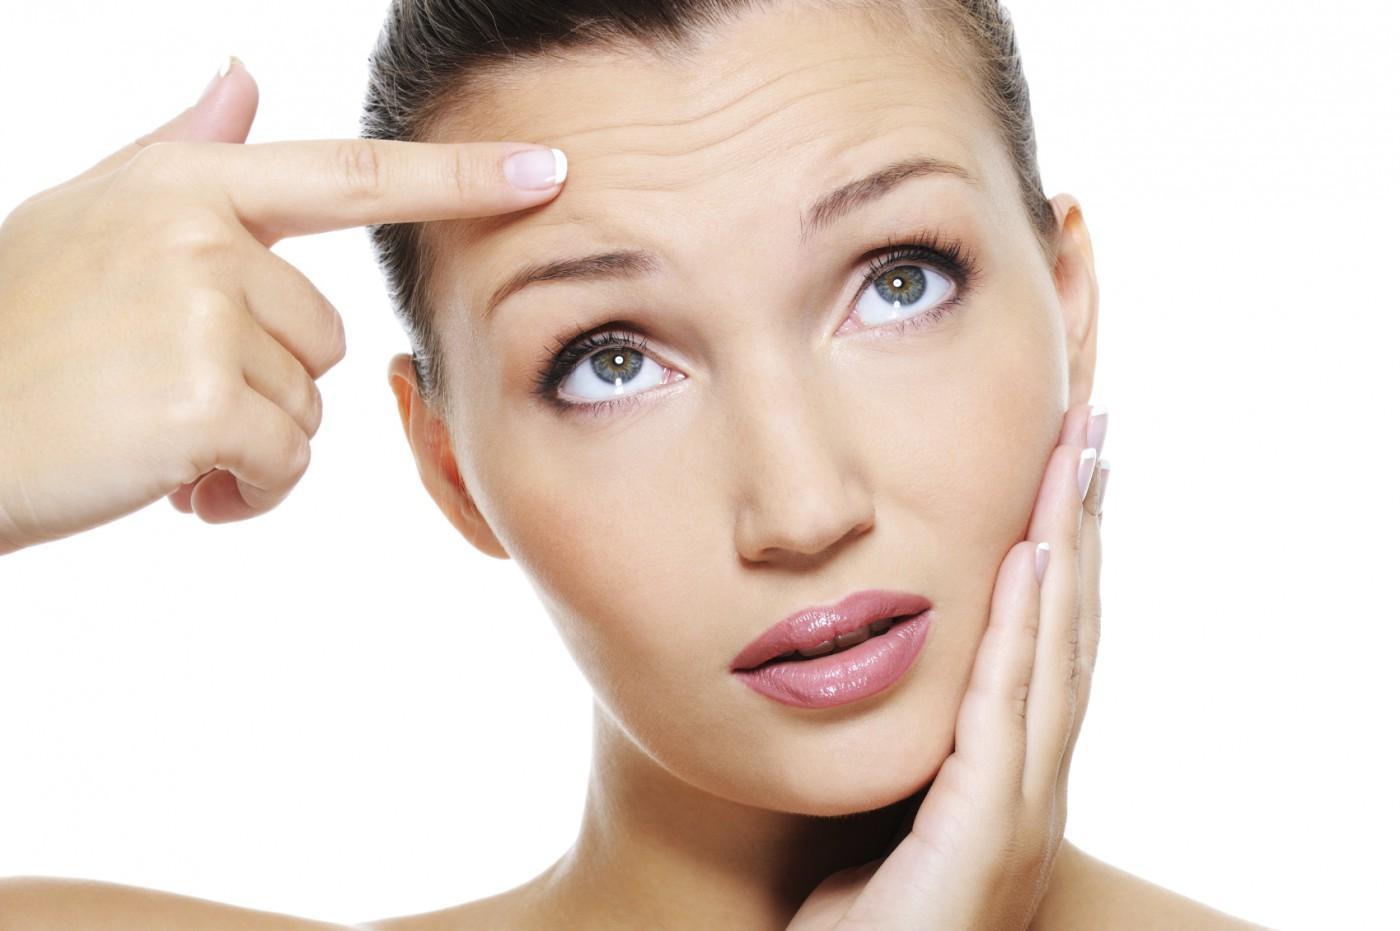 Afectiunile ochiului: cauze, simptome si tratament | Medlife